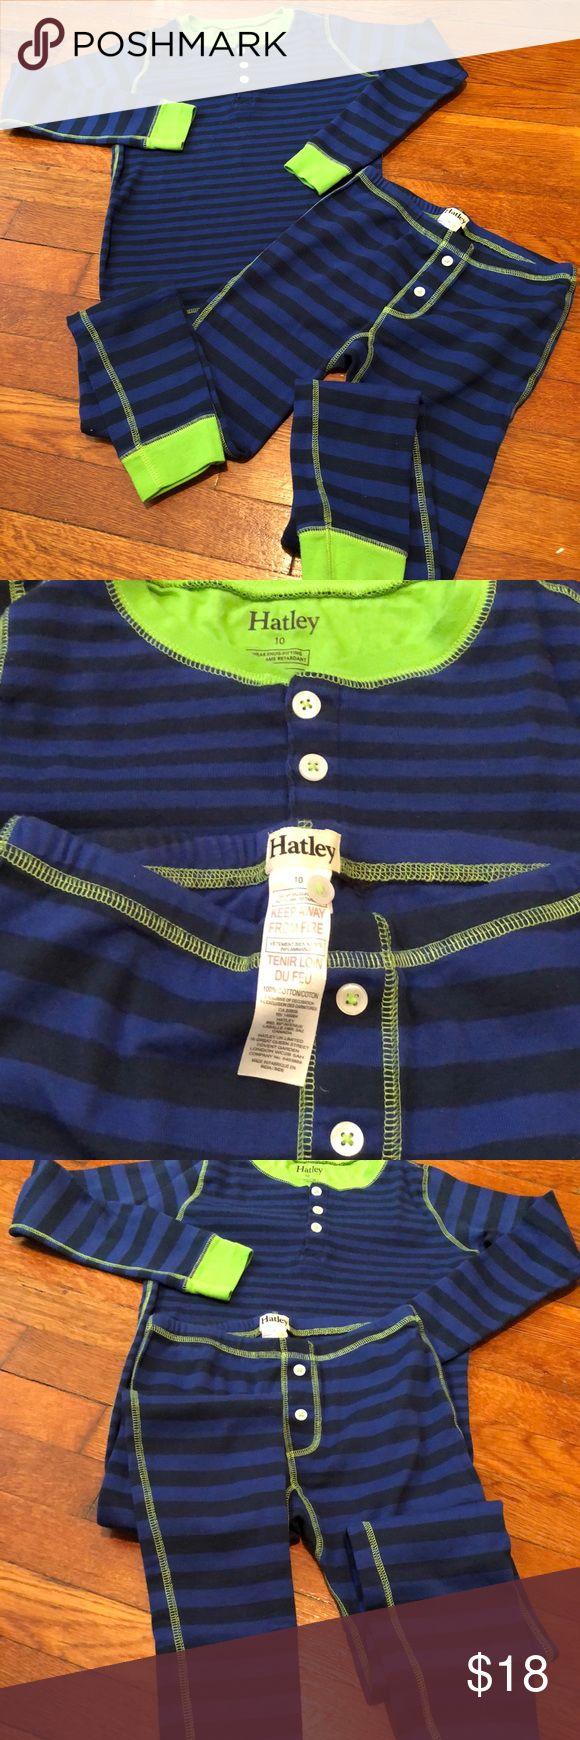 Boy's Hately pajama set. Size 10 Excellent condition  Worn once No signs of wear Super cute comfy boy's pj's Hatley Pajamas Pajama Sets